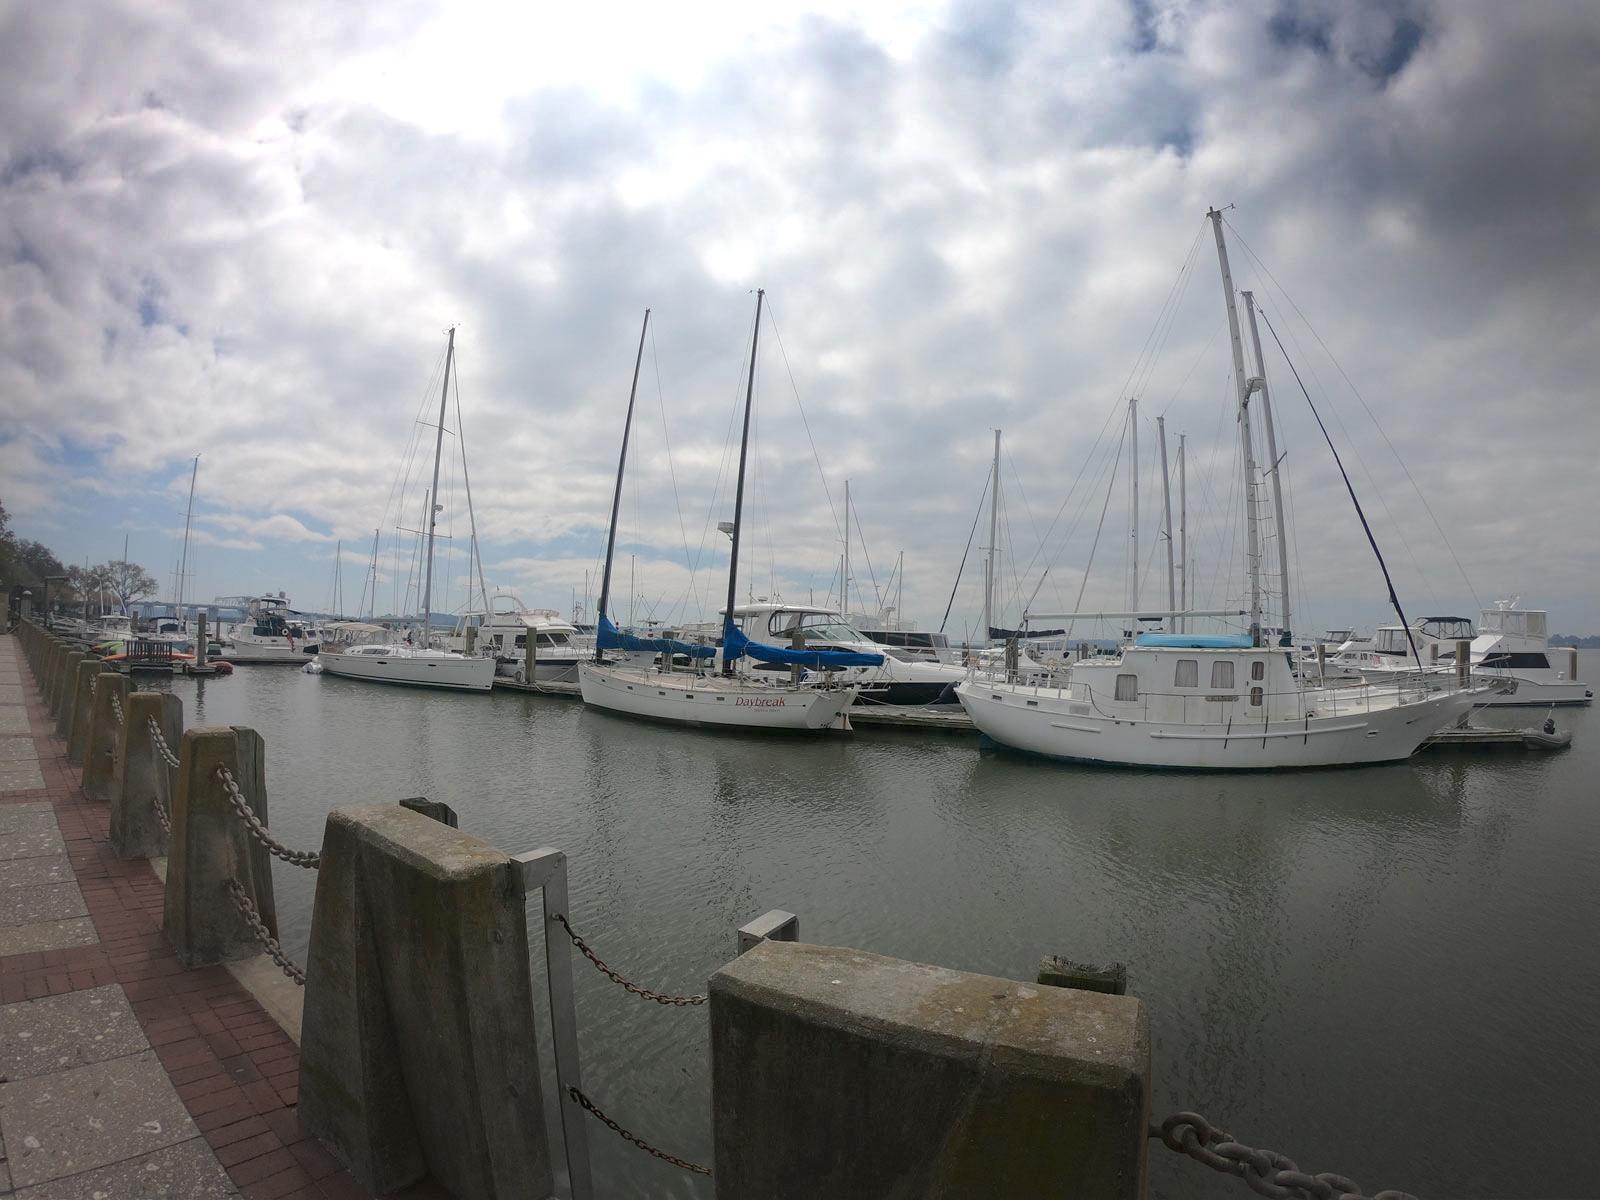 Beaufort, South Carolina Riverfront